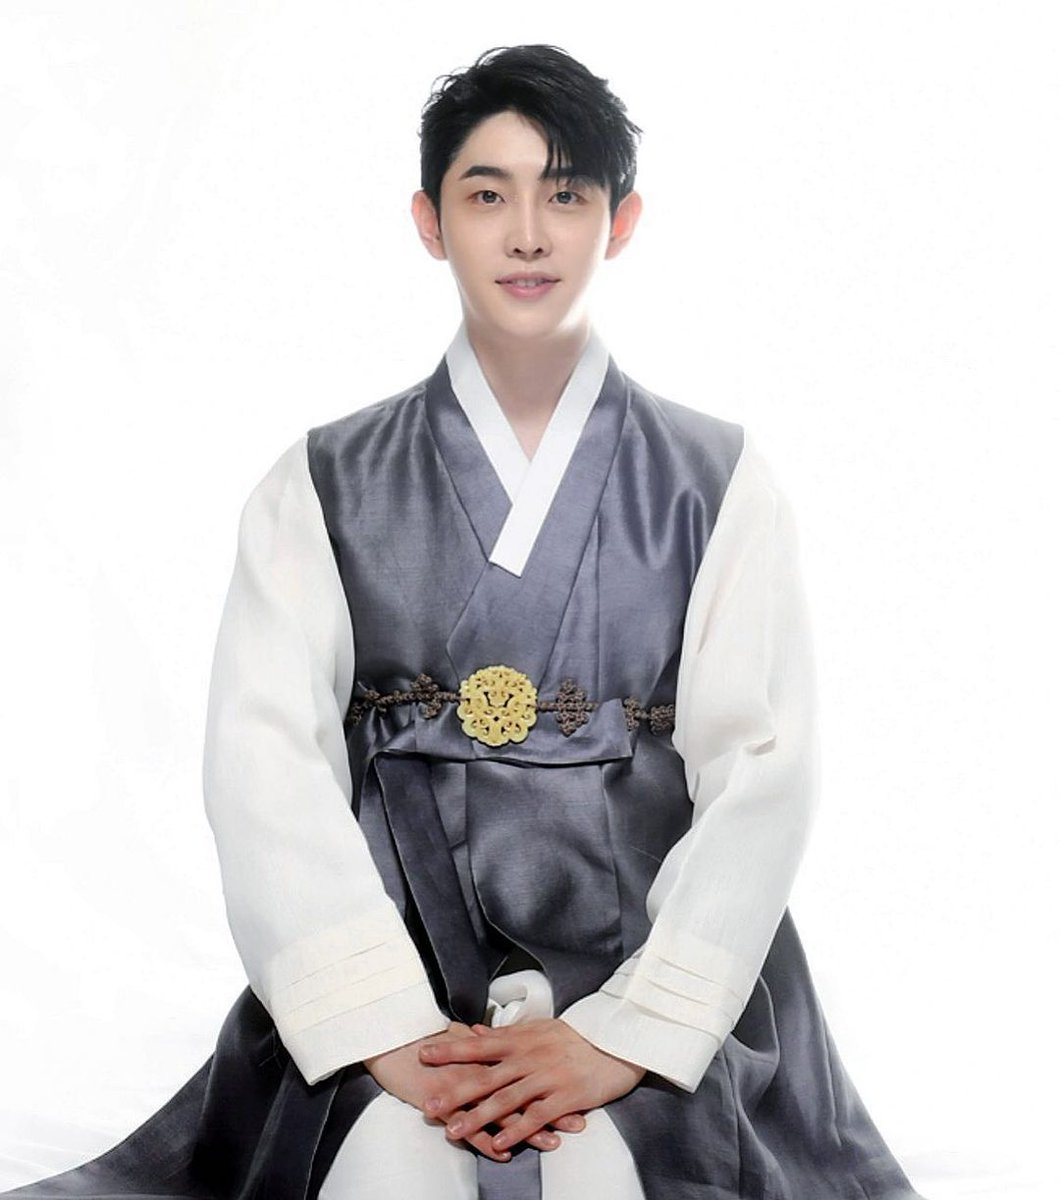 210919~ #Hyunho Instagram update 🐥  'Felice Chuseok Day'   #moneymoneymoney #ParkHyunho #돈돈돈  #박현호